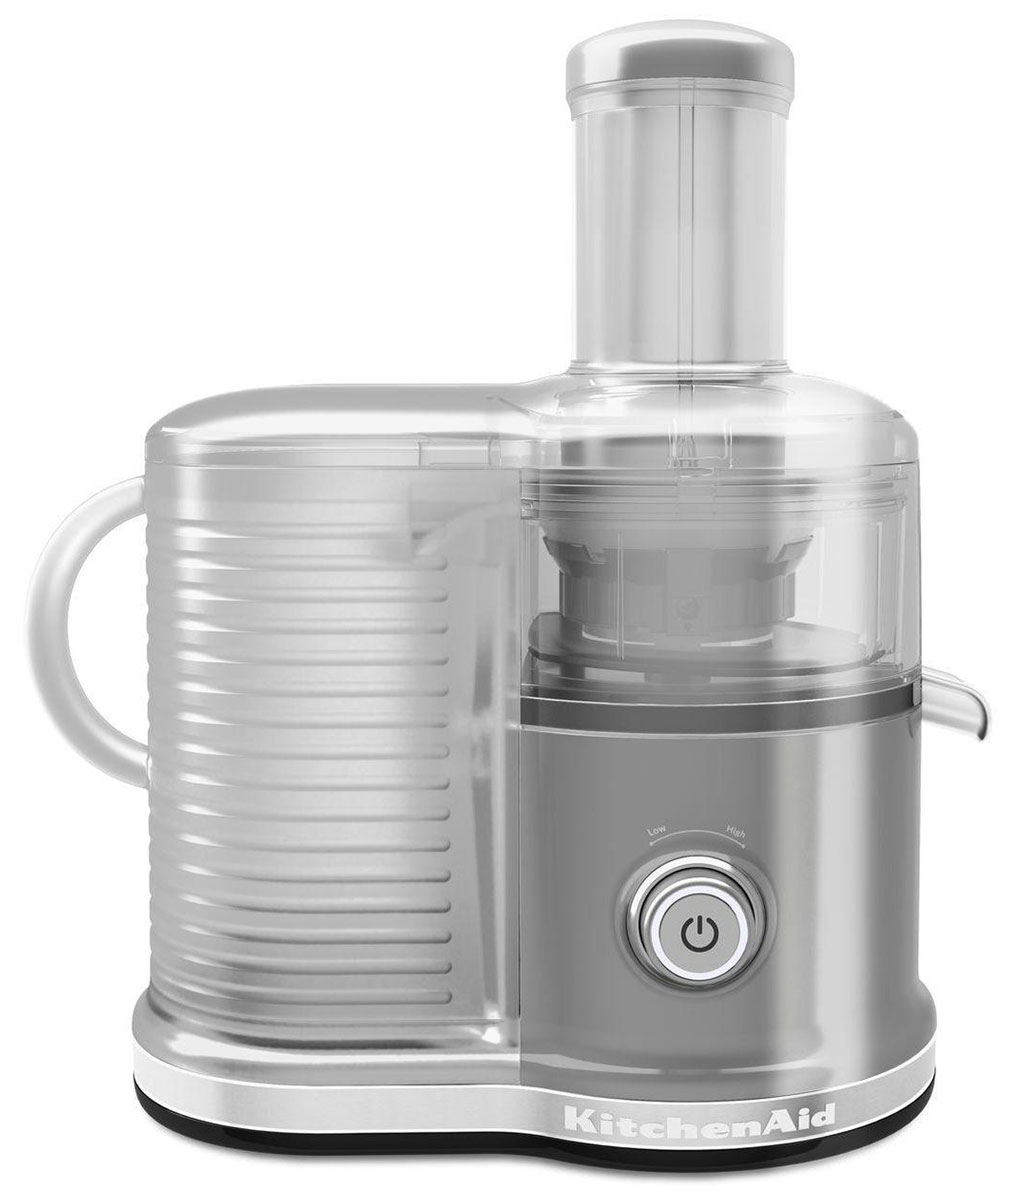 KitchenAid Artisan 5KVJ0333, Silver соковыжималка - Соковыжималки